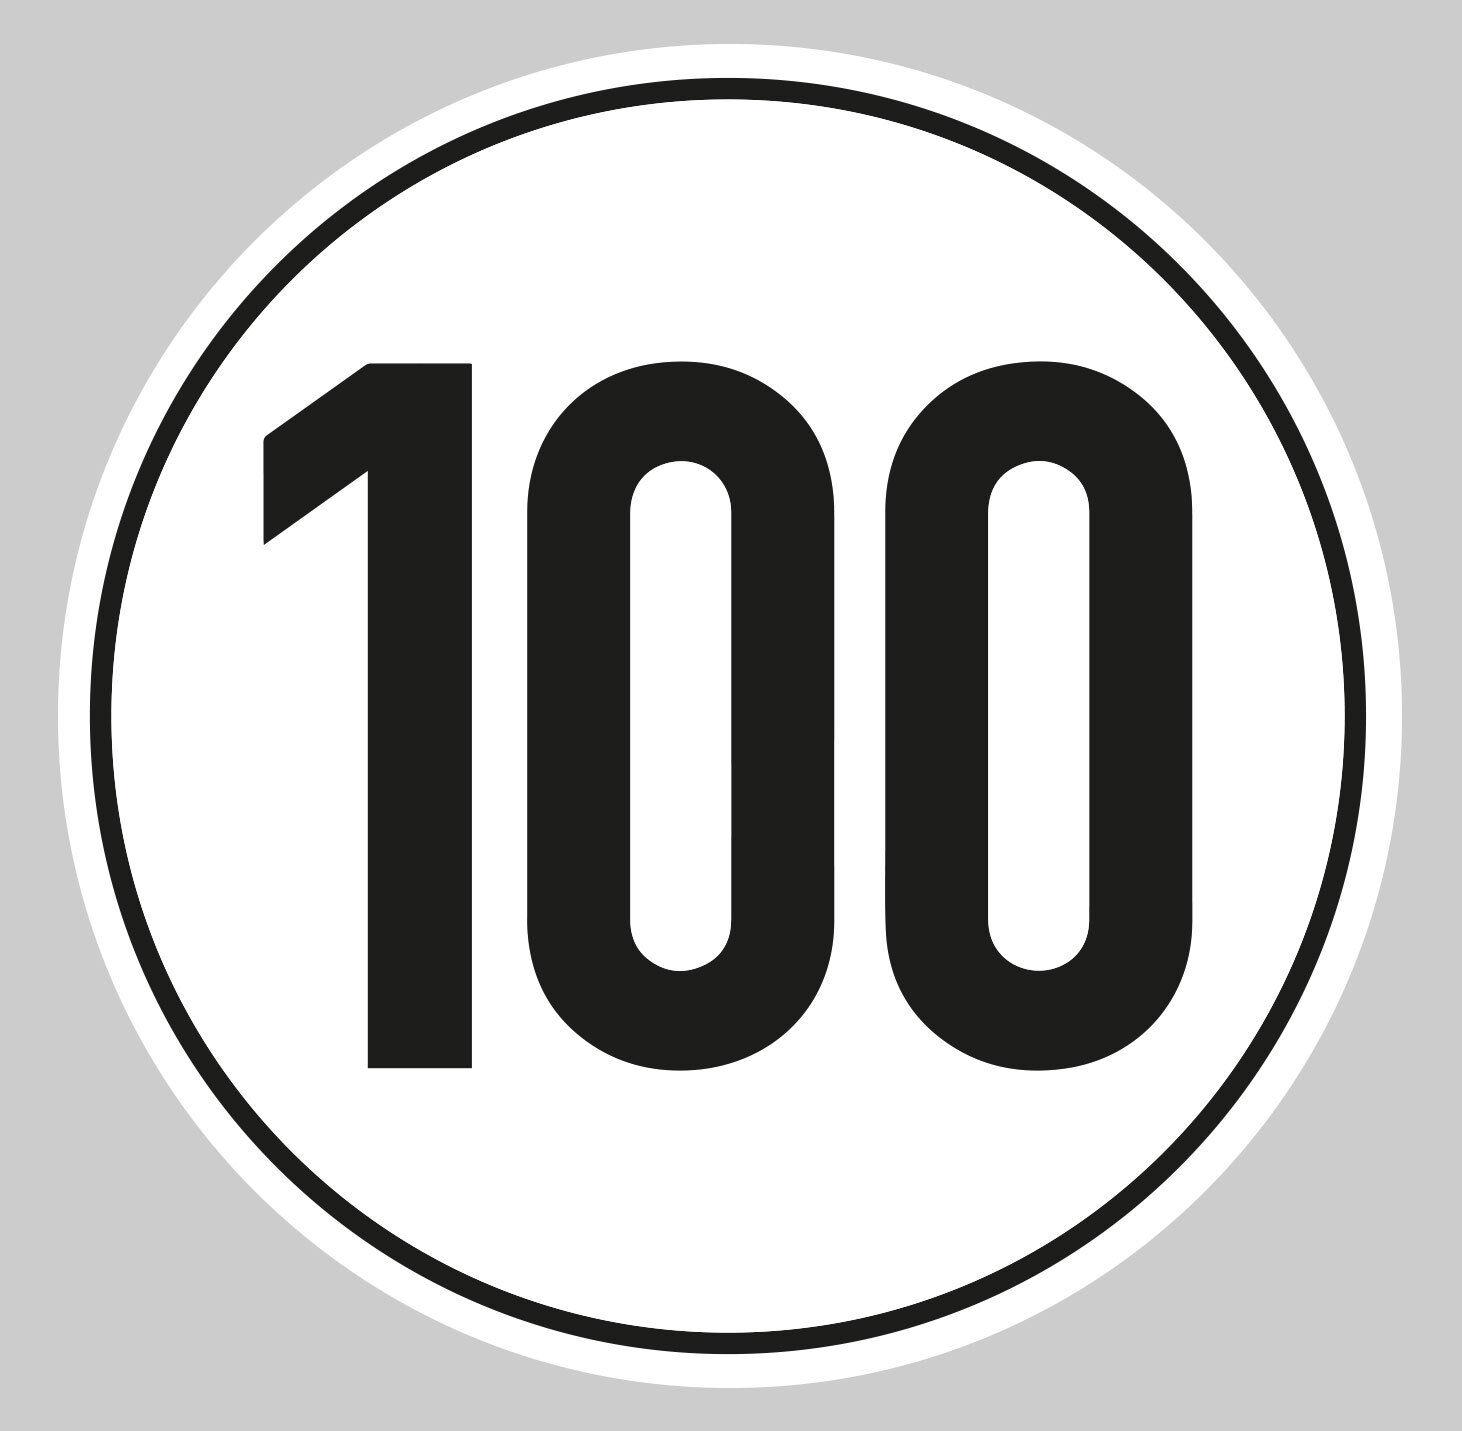 Aufkleber 100 kmh für Anhänger Mofa Wohnmobil Trailer Vespa 10cm Wetterfest